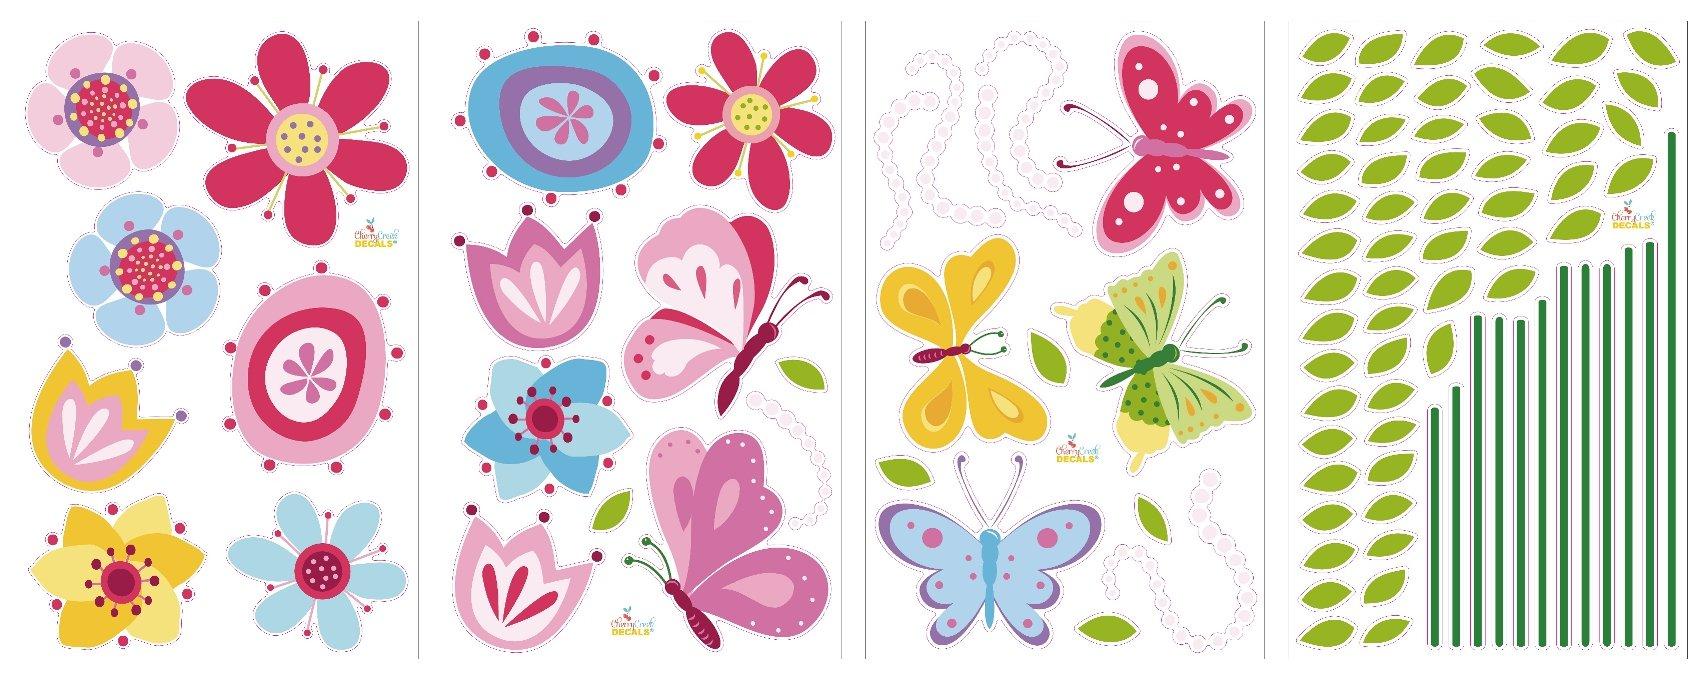 Bright Butterfly Garden Decorative Peel & Stick Wall Art Sticker Decals by CherryCreek Decals (Image #4)